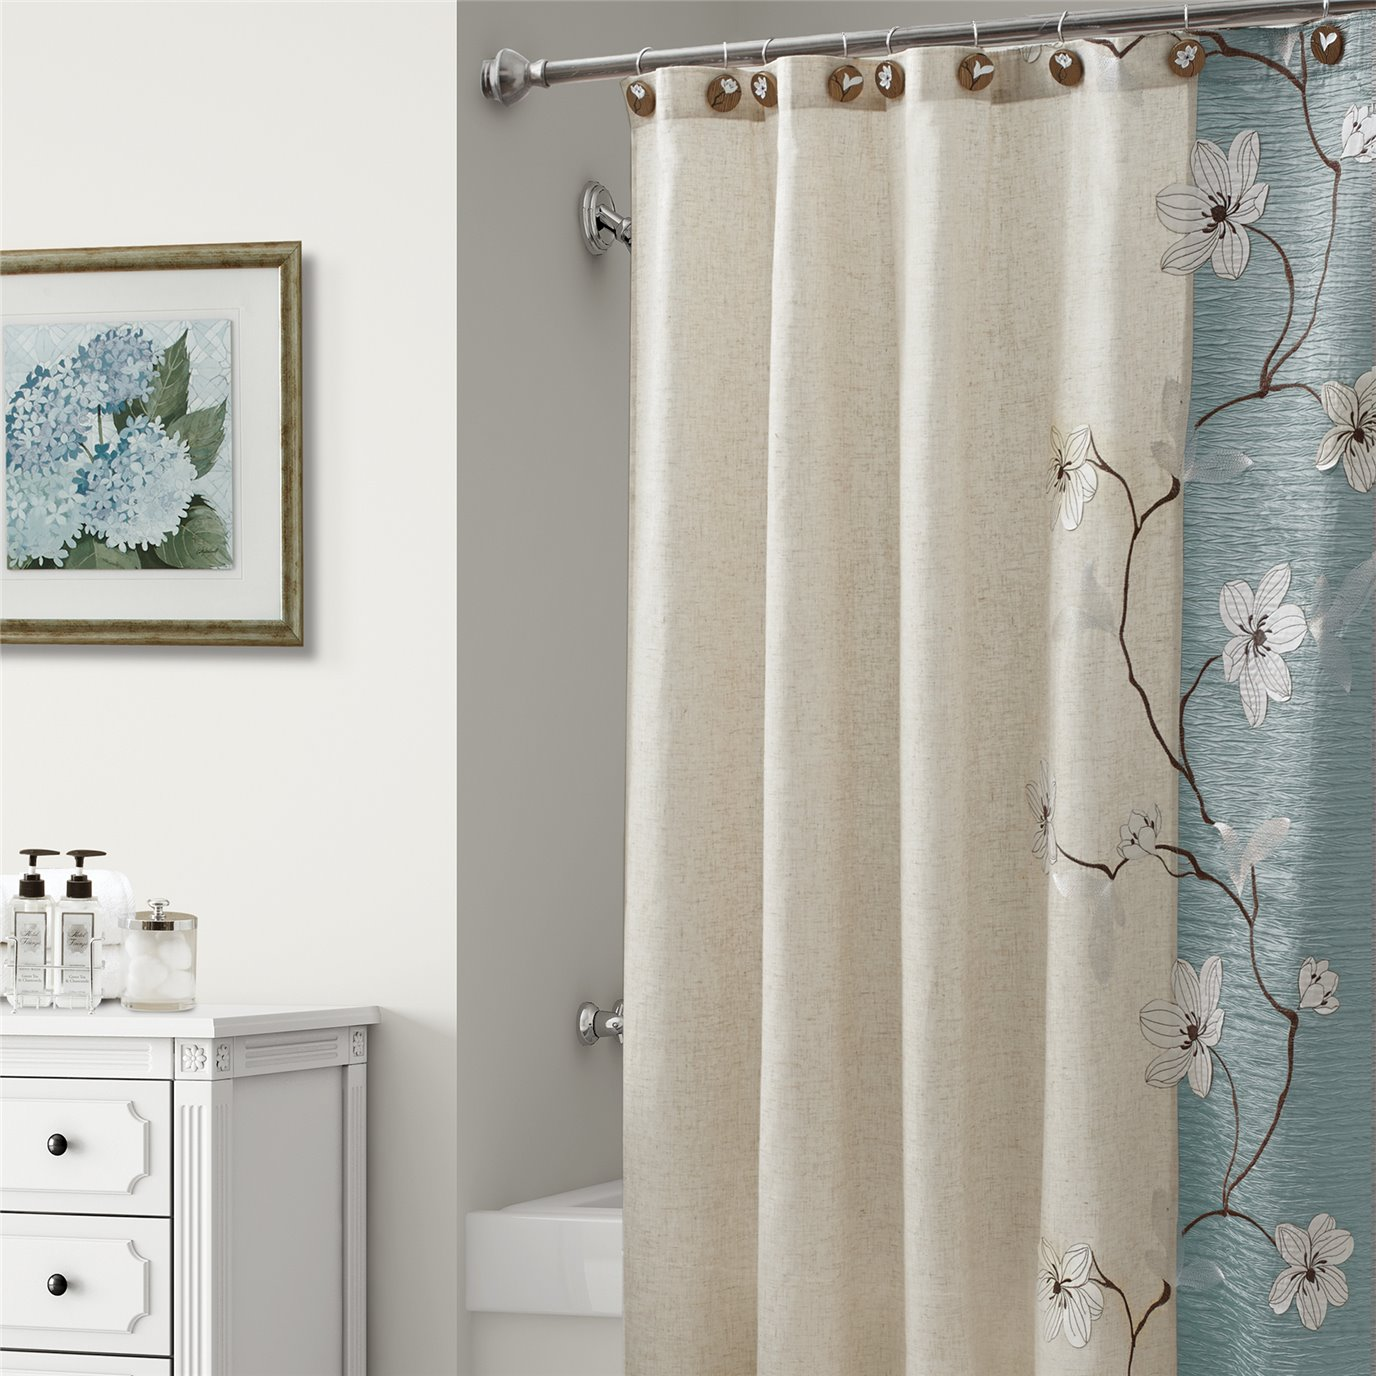 Magnolia Shower Curtain Seafoam 70X72 by Croscill